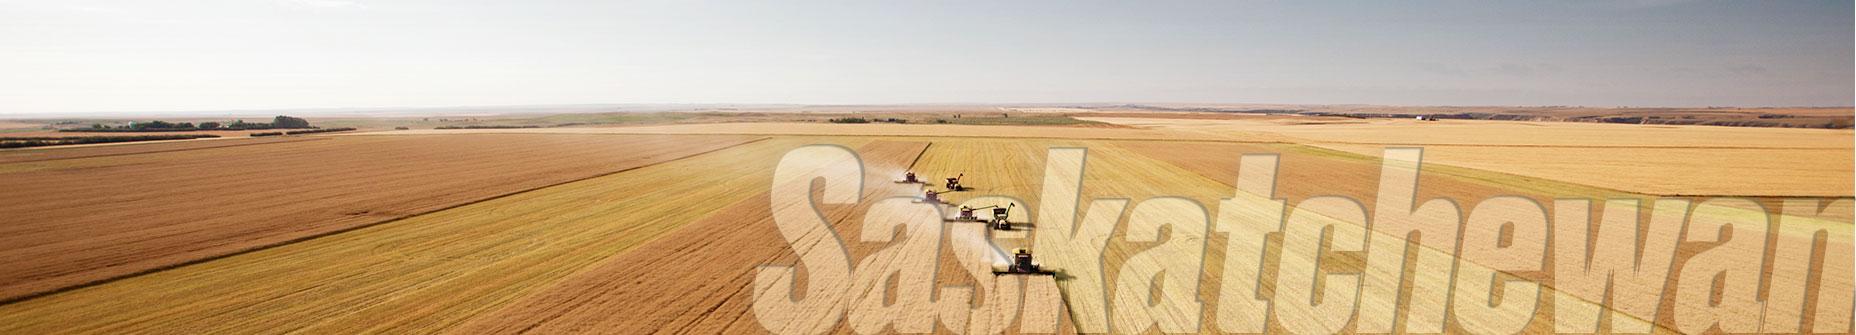 sk-panoramatop.jpg